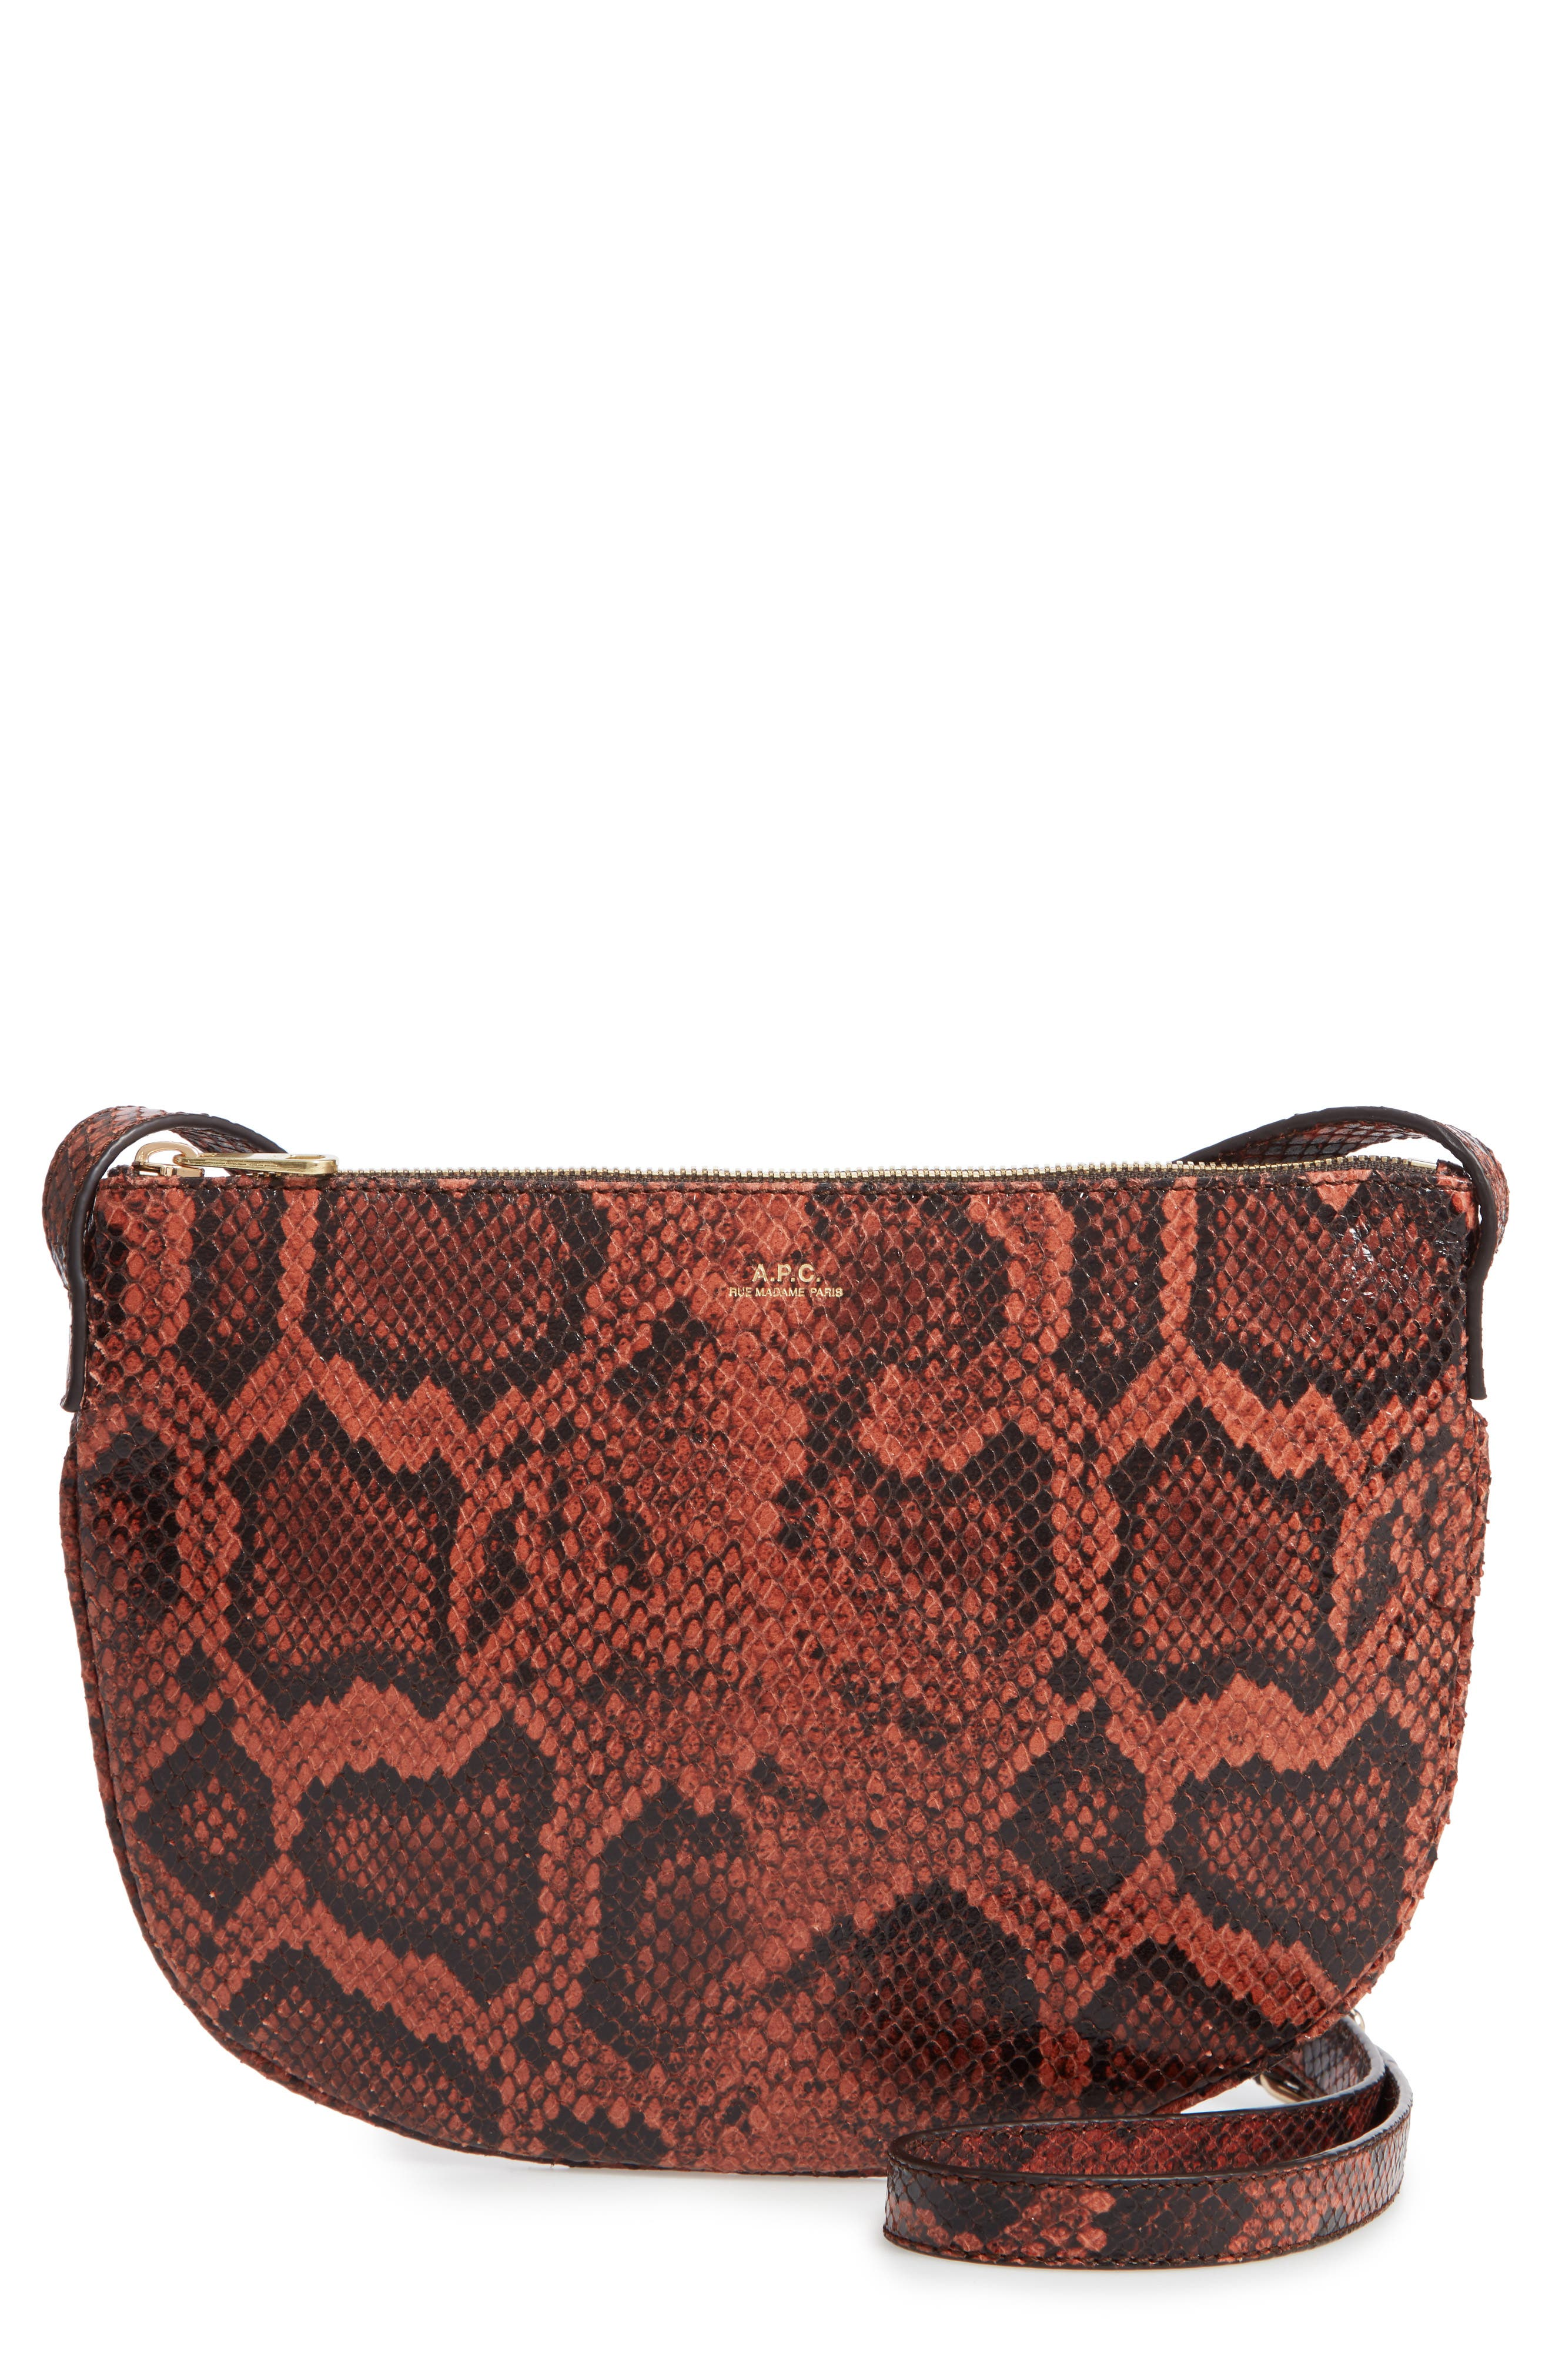 A.P.C. Sac Maelys Python Embossed Leather Crossbody Bag, Main, color, EAF BRIQUE